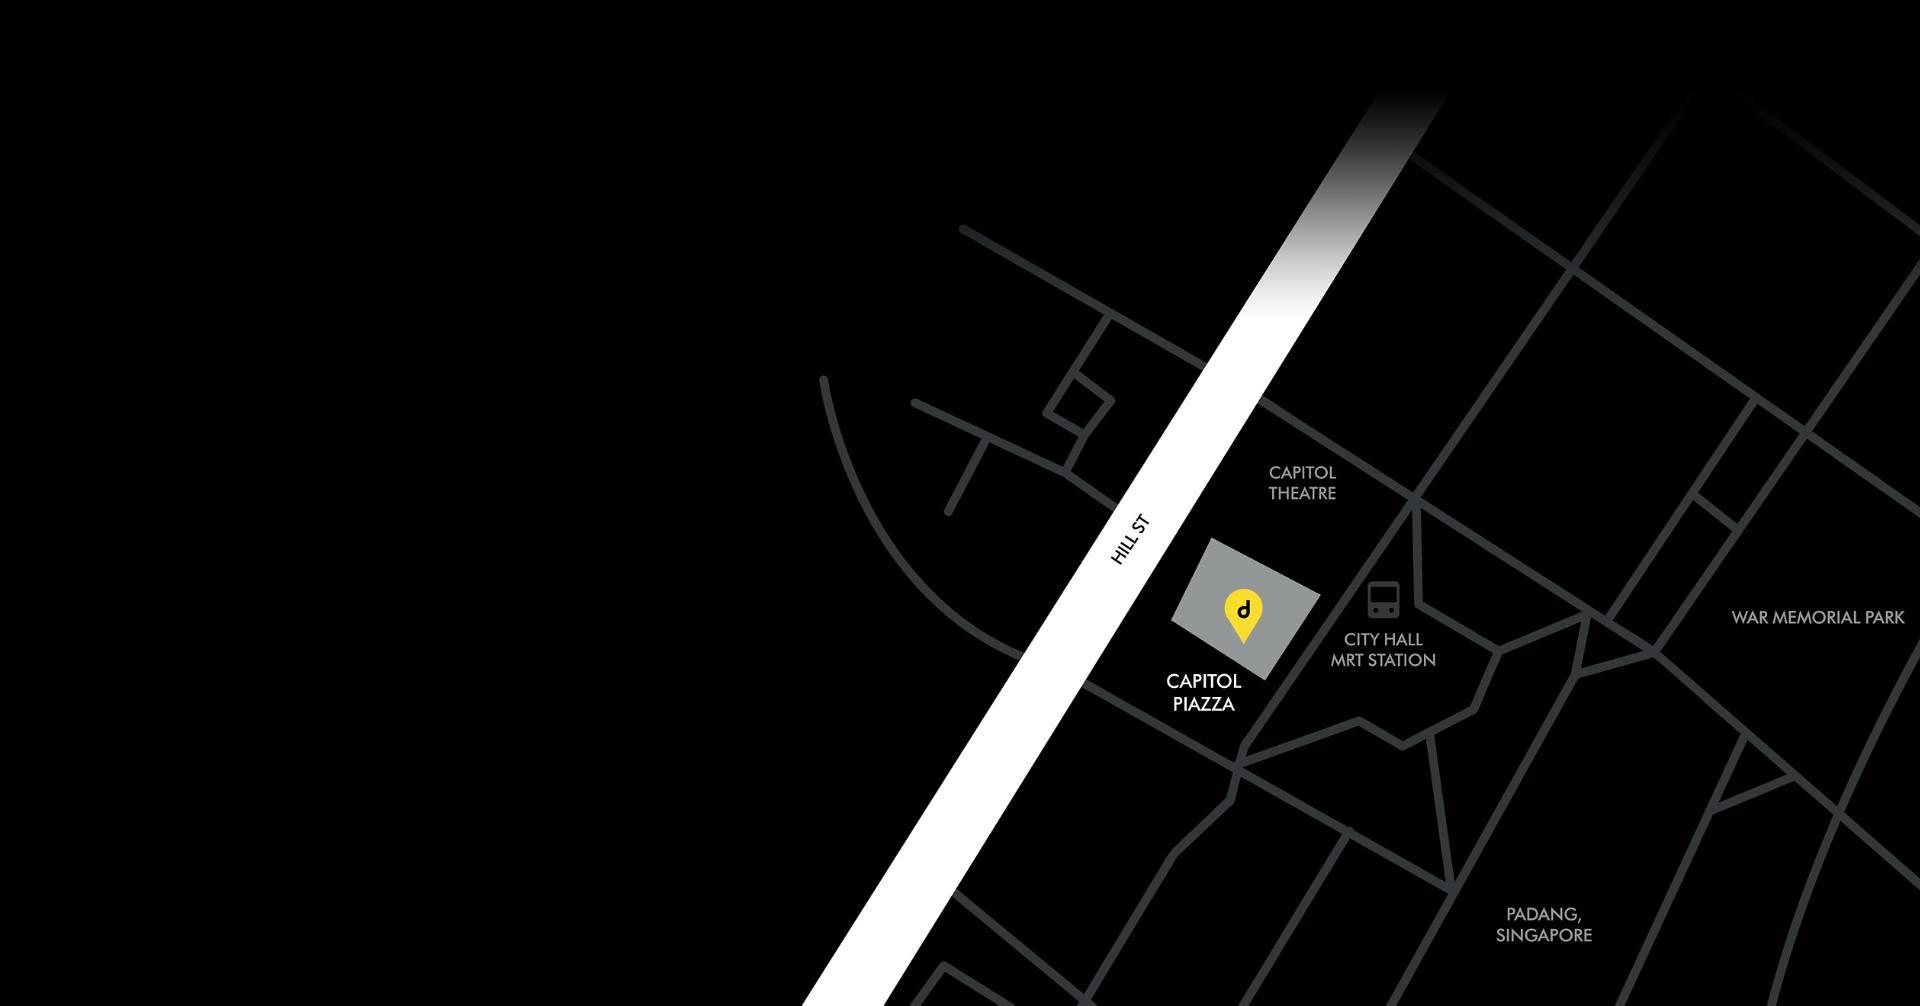 Dyson Demo商店在新加坡地图上图betvicror赞助欧洲杯